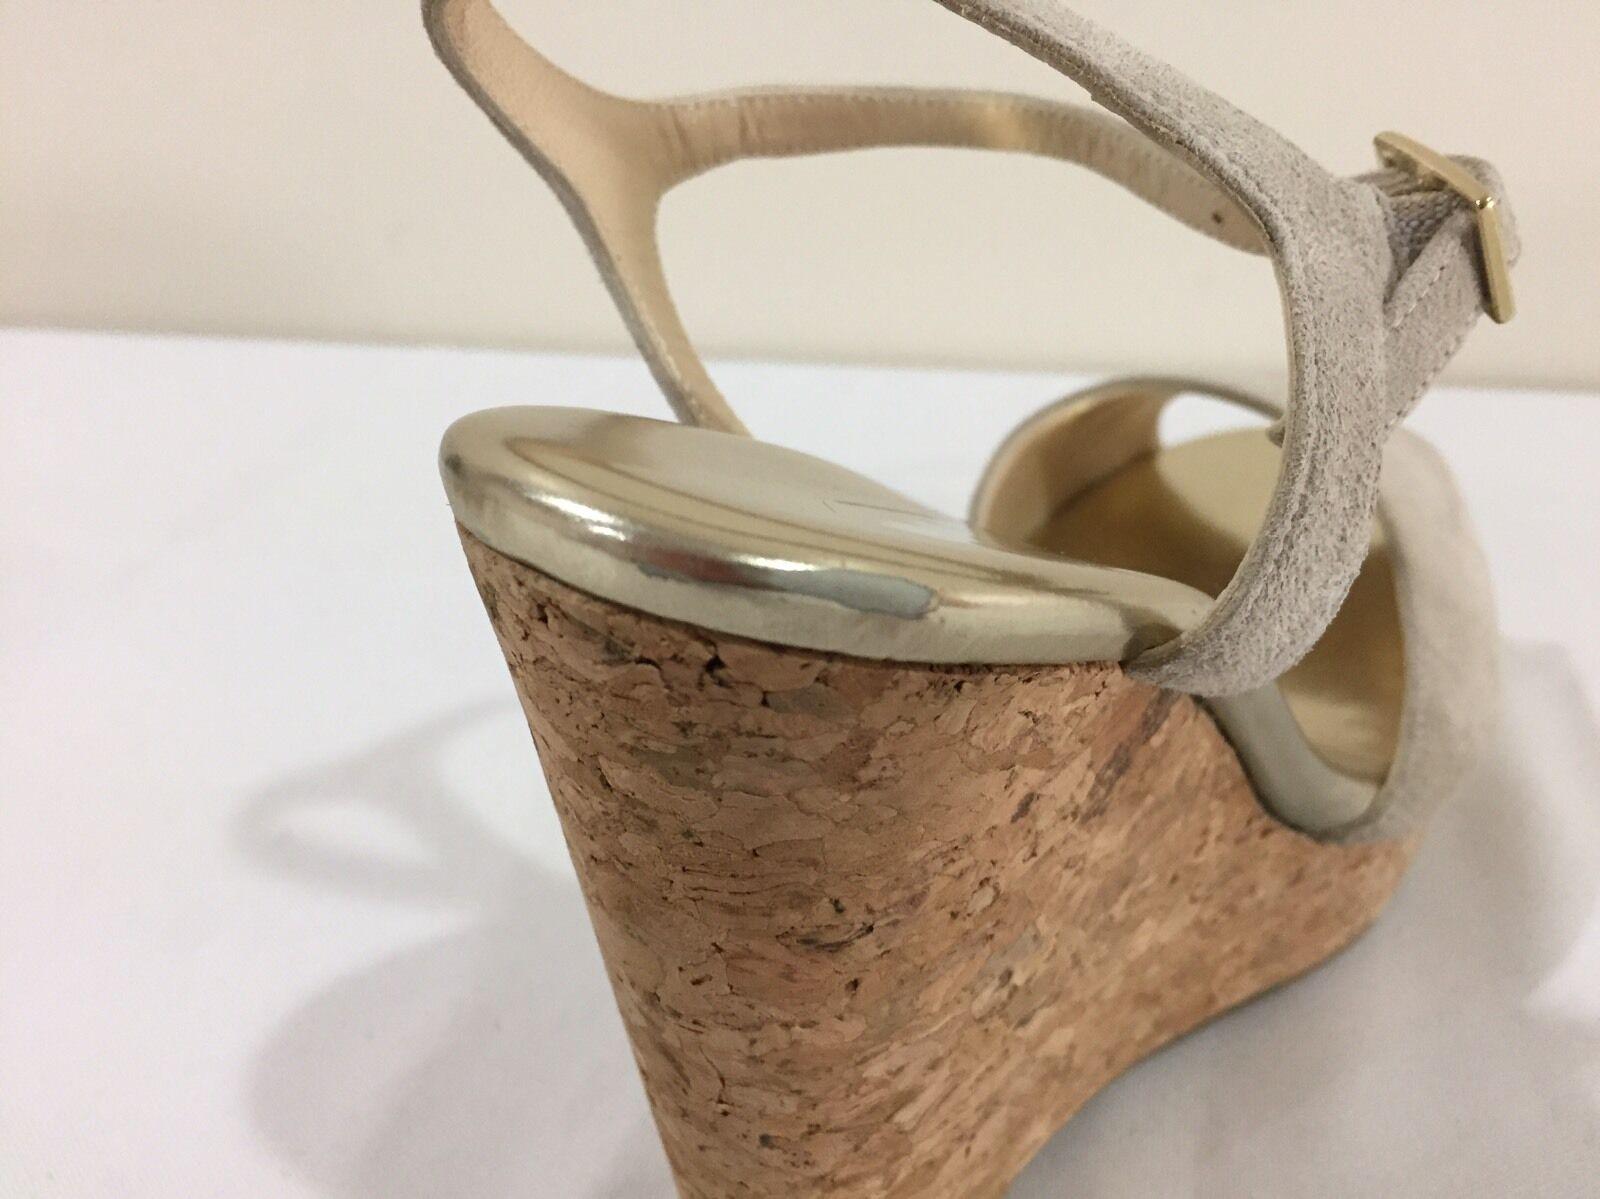 Jimmy Choo Cork 'Perla' Beige (Natural) Suede Cork Choo Wedge Sandals Size 40.5/10 $525.00 50d362